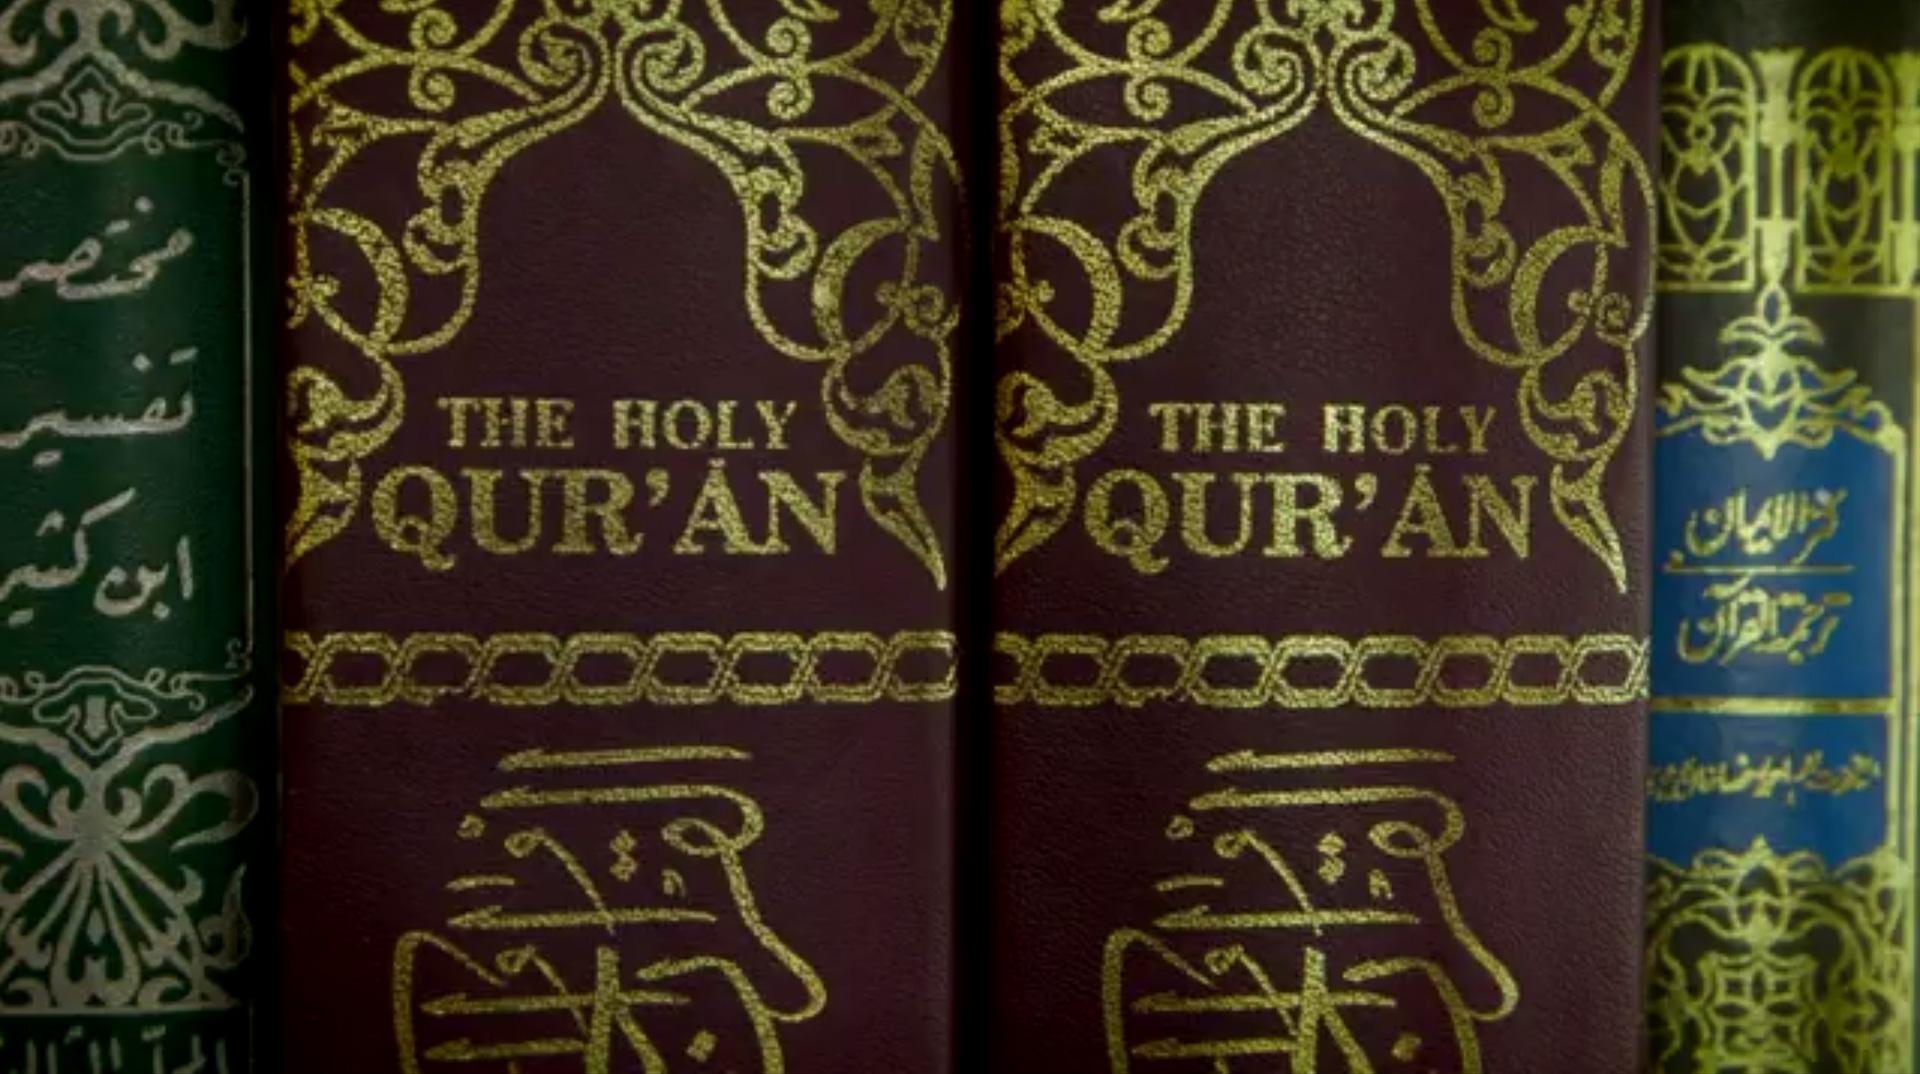 BBC-iwonder-Shias-Sunnis-Mosaic_Films.jpg